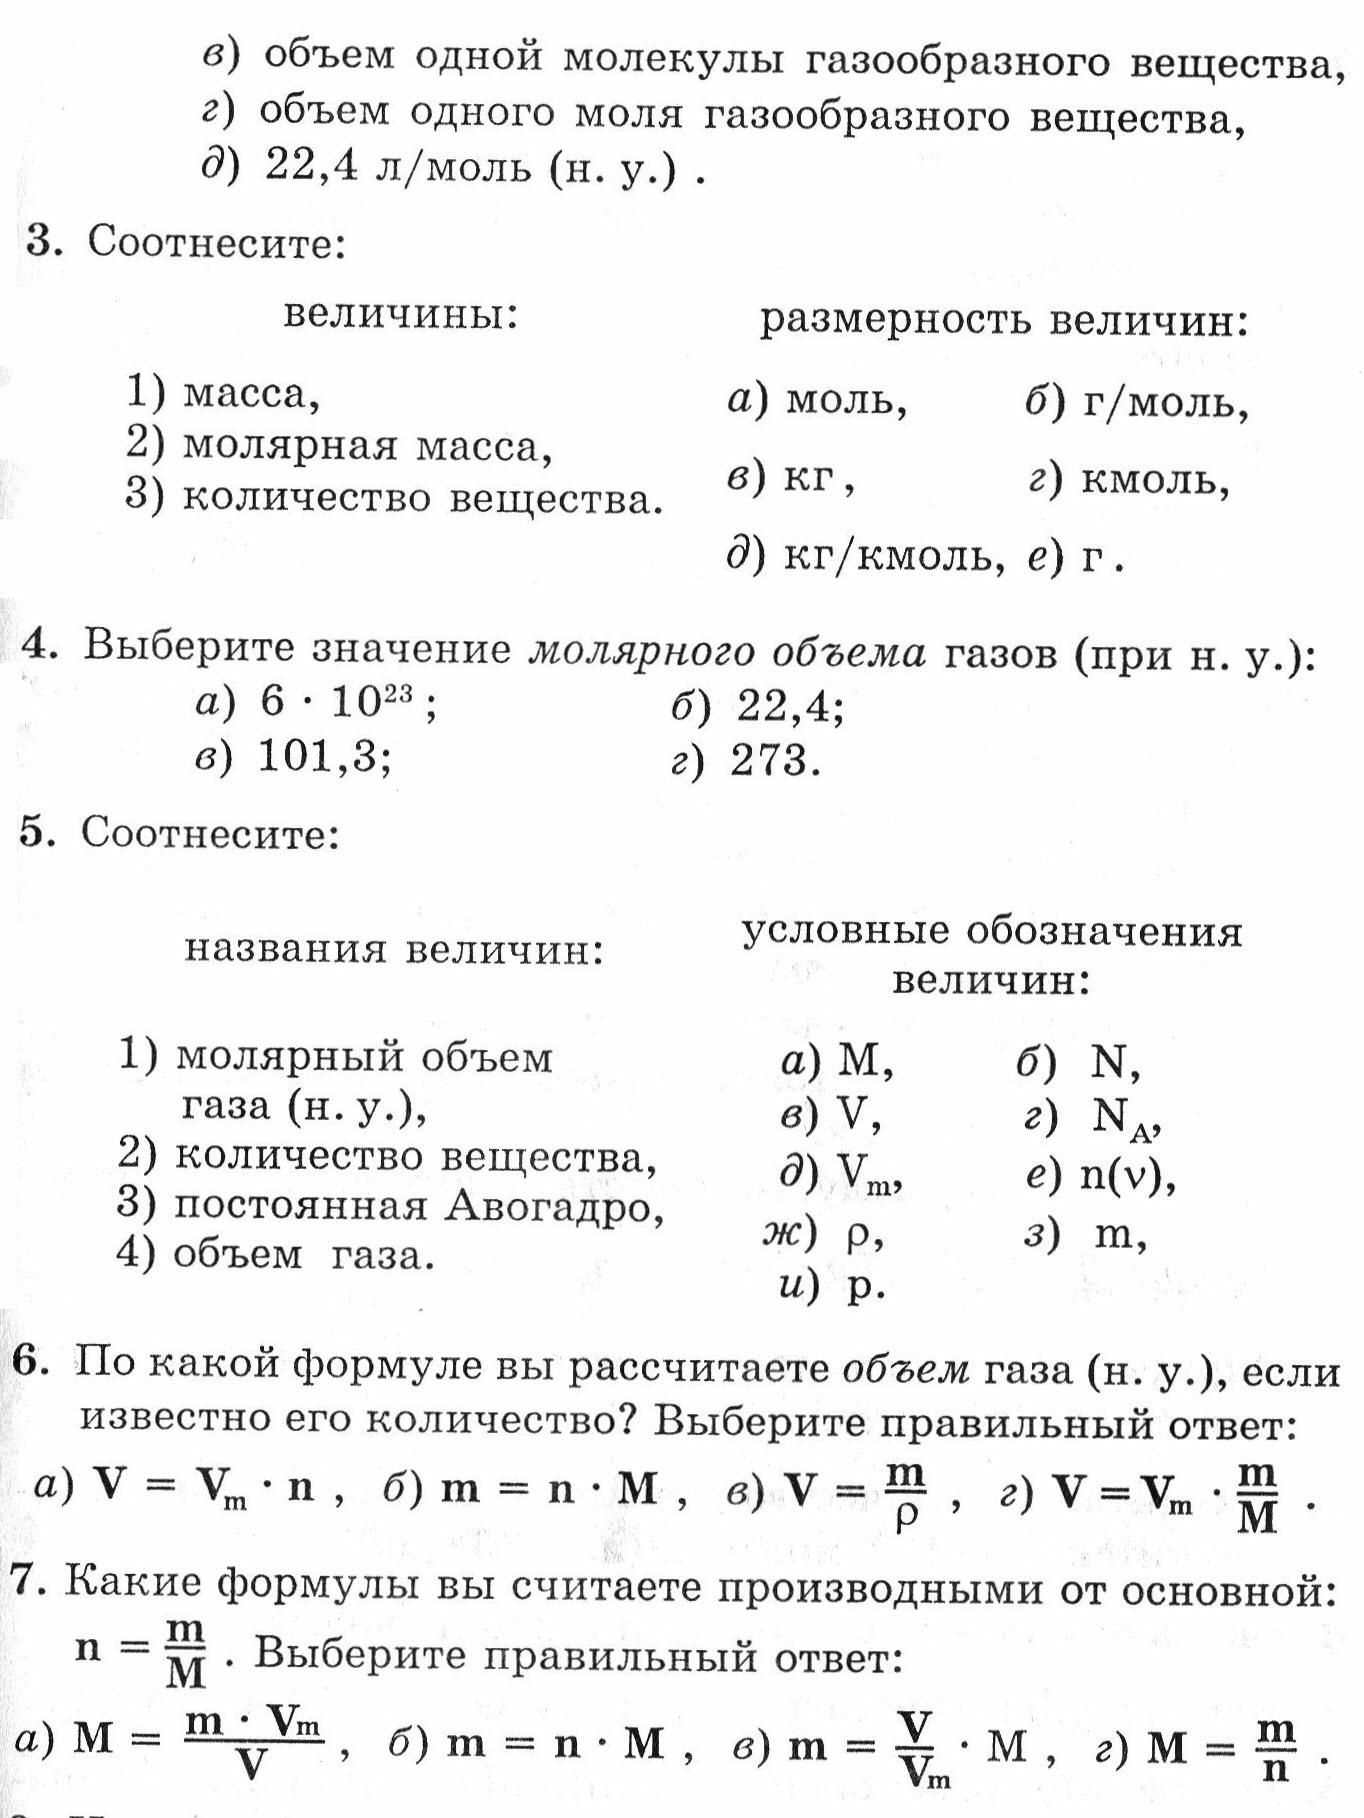 Химия 8 класс решение задач количество вещества задачи лизинг решение